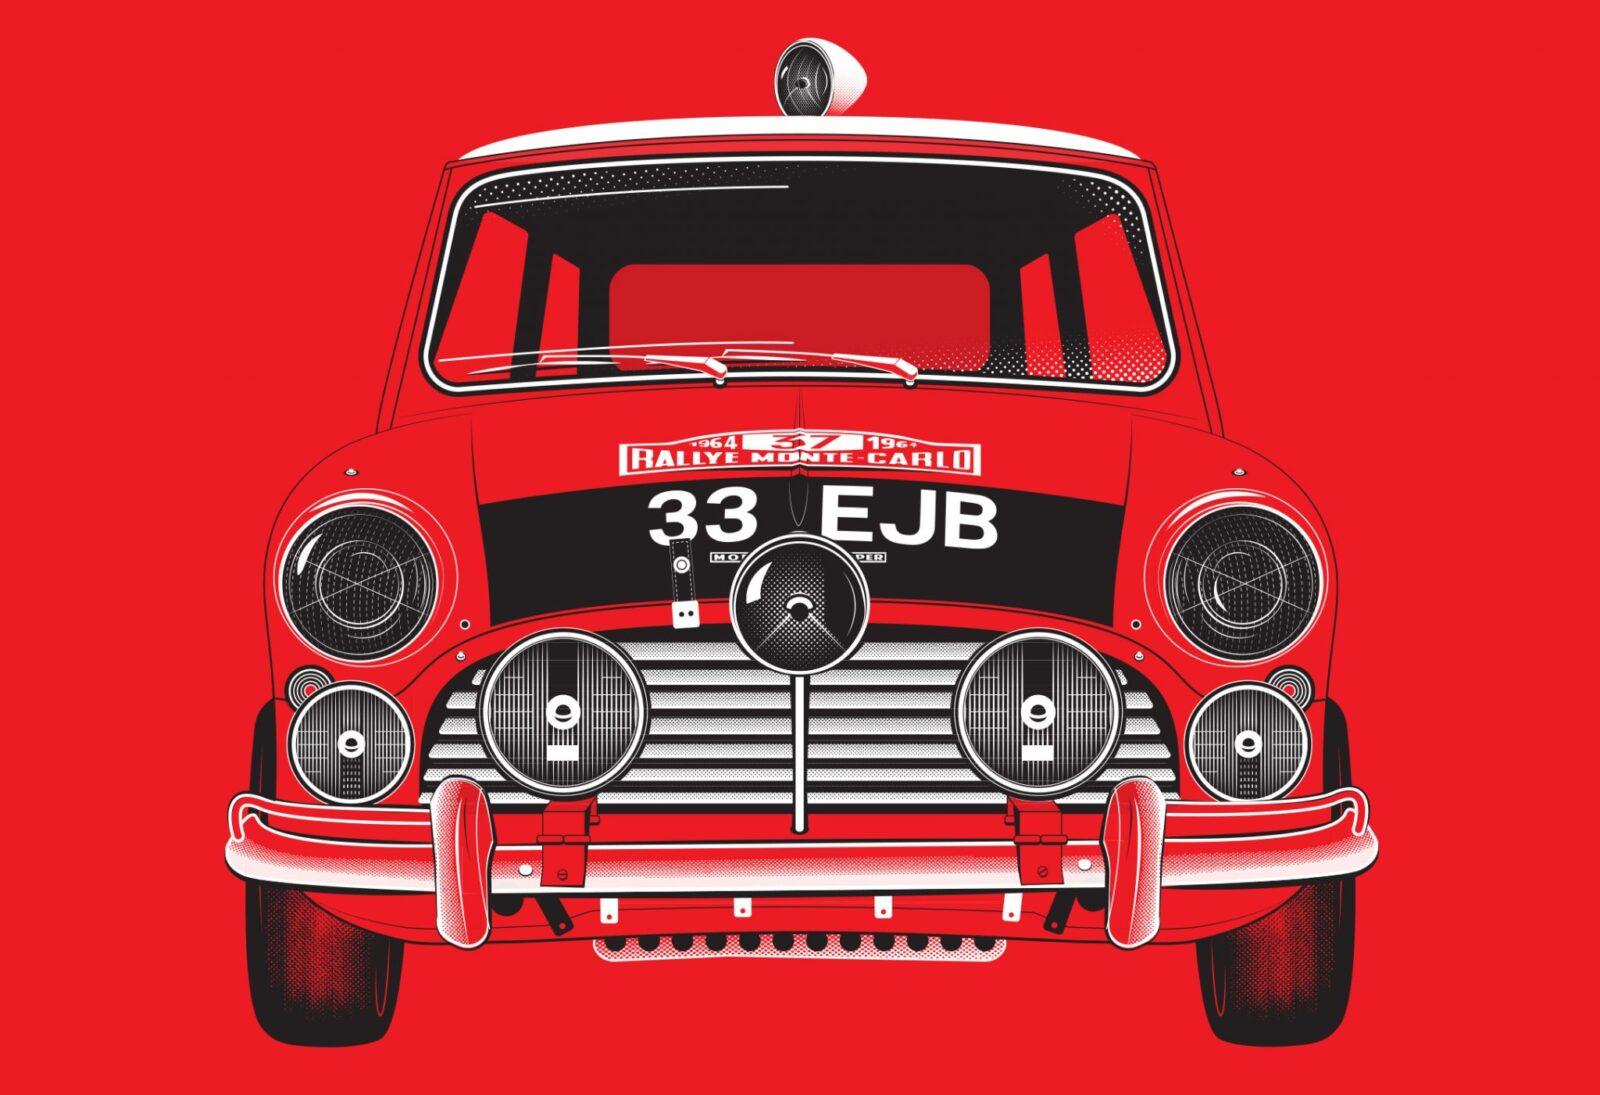 Monte Carlo Mini Poster 1600x1095 - Monte Carlo Mini Poster